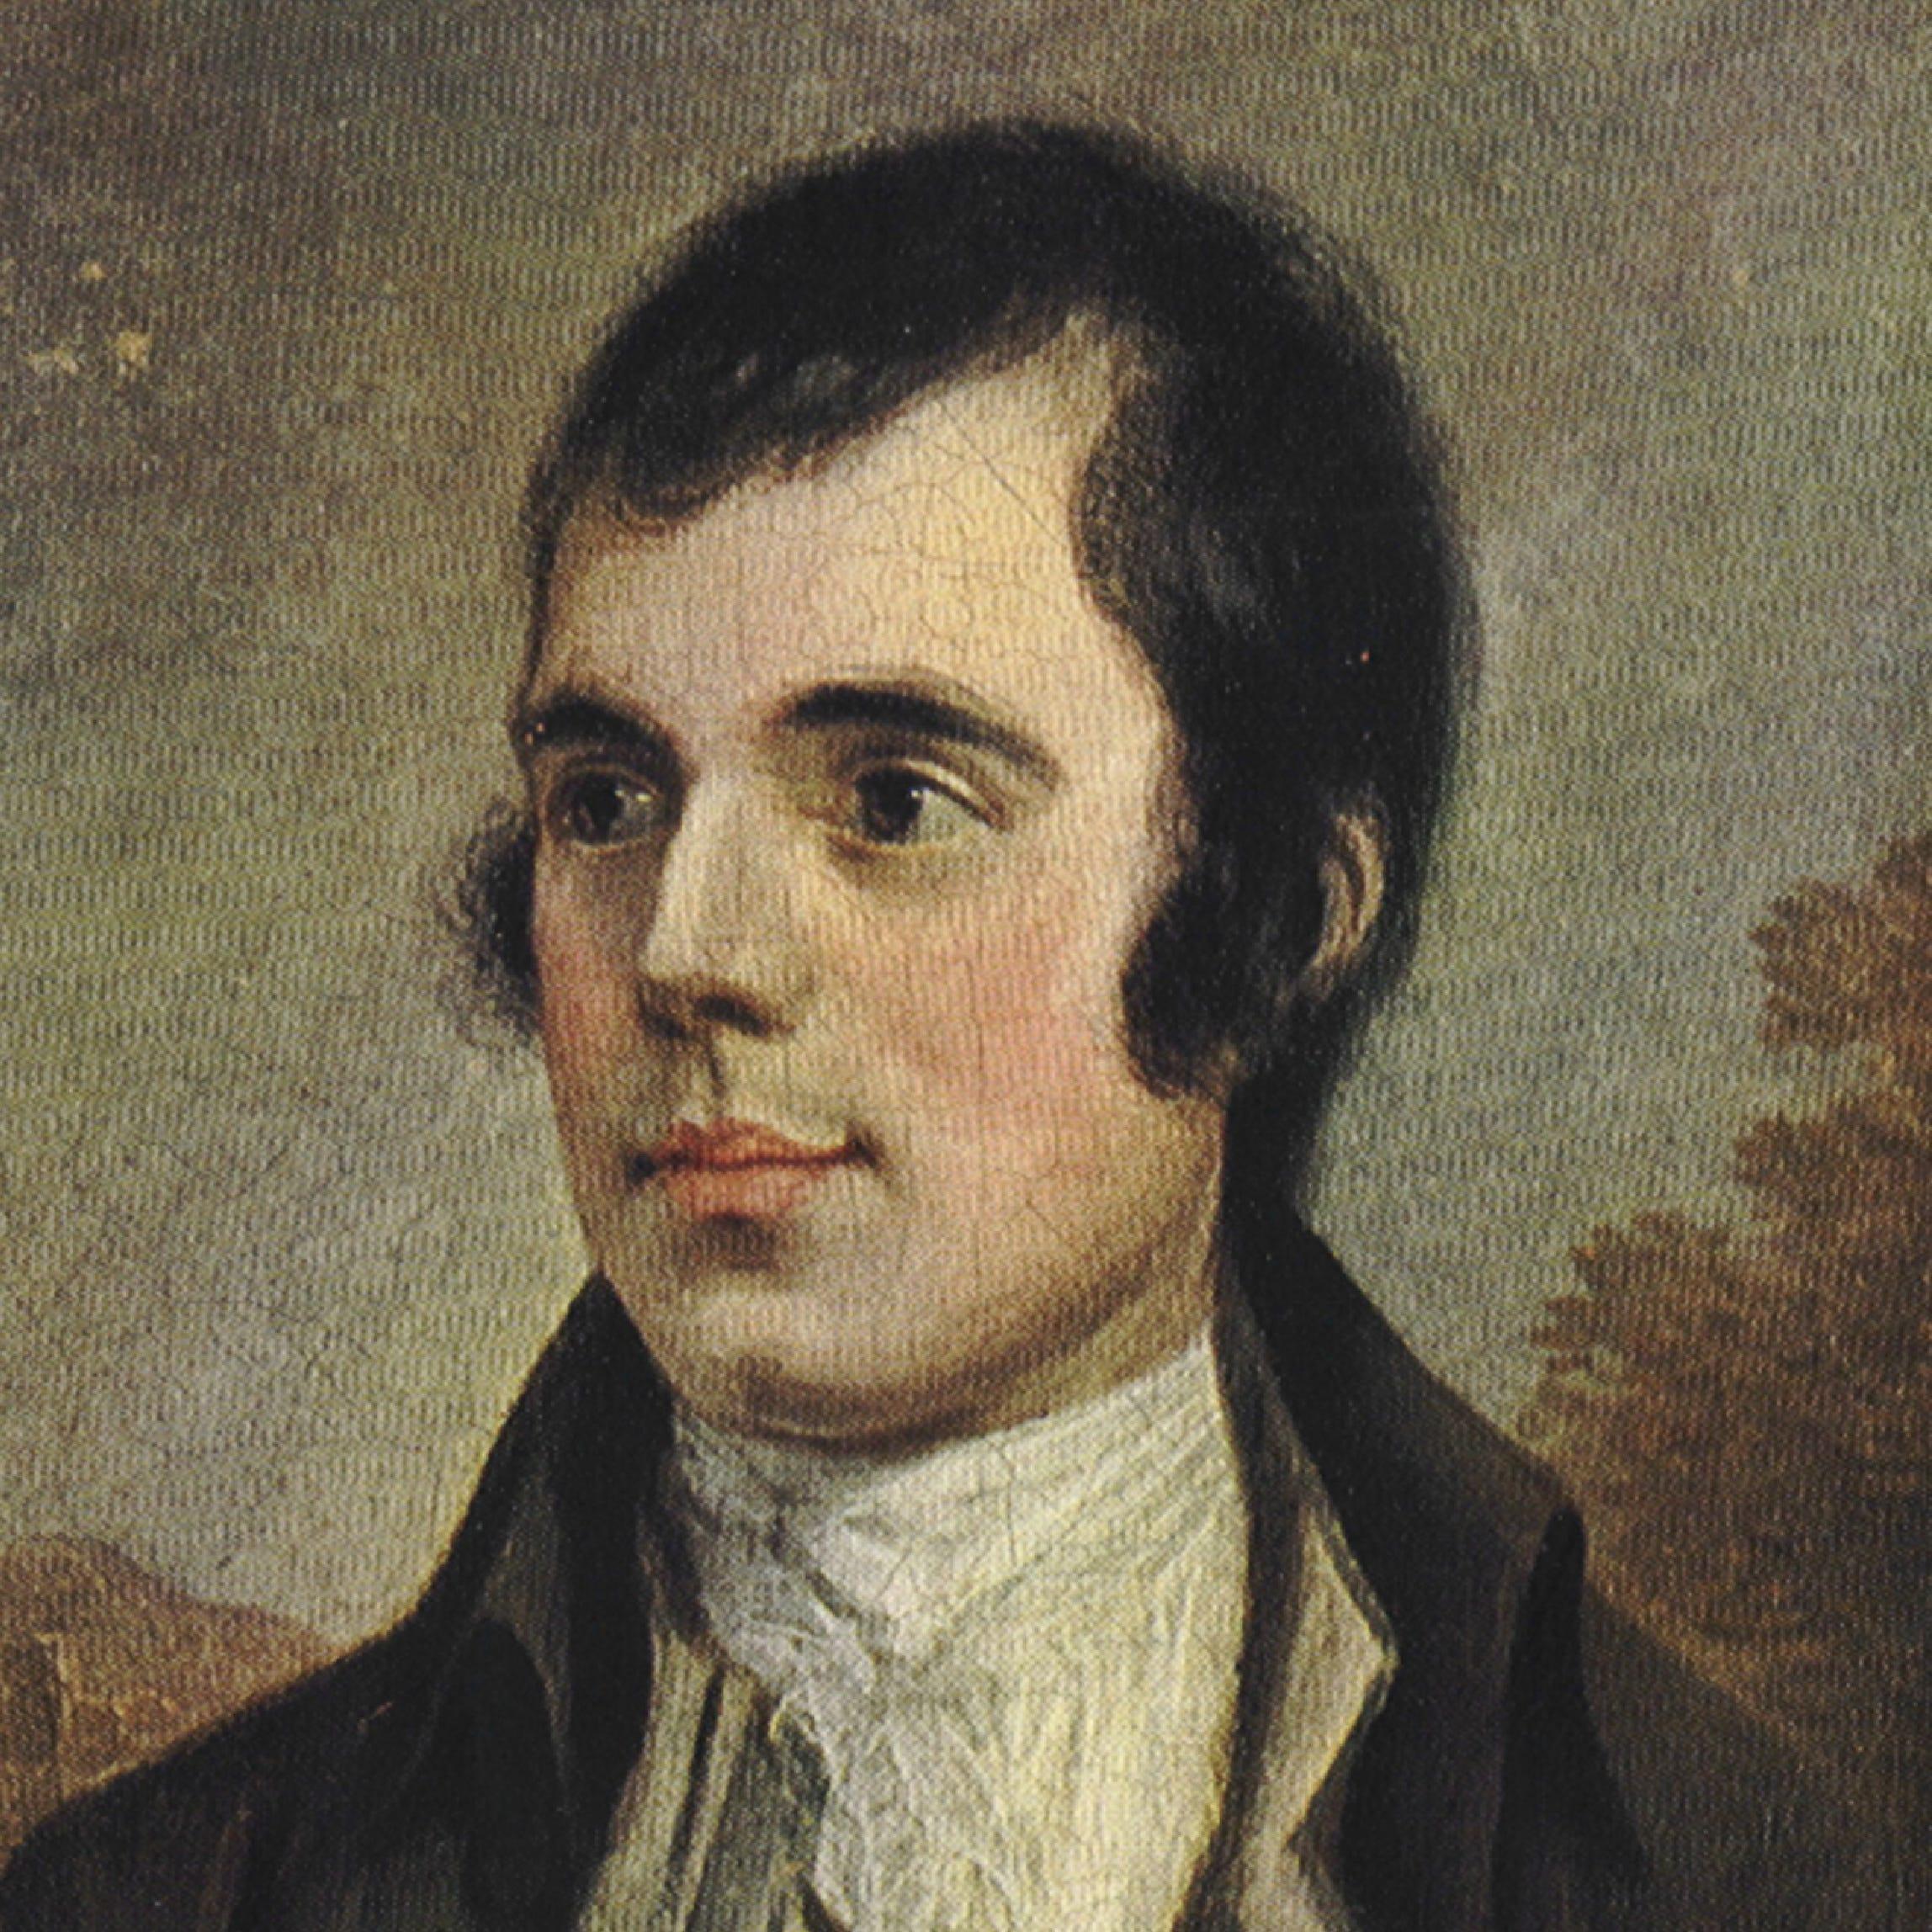 Don a kilt, regale the haggis to celebrate Scottish poet Robert Burns